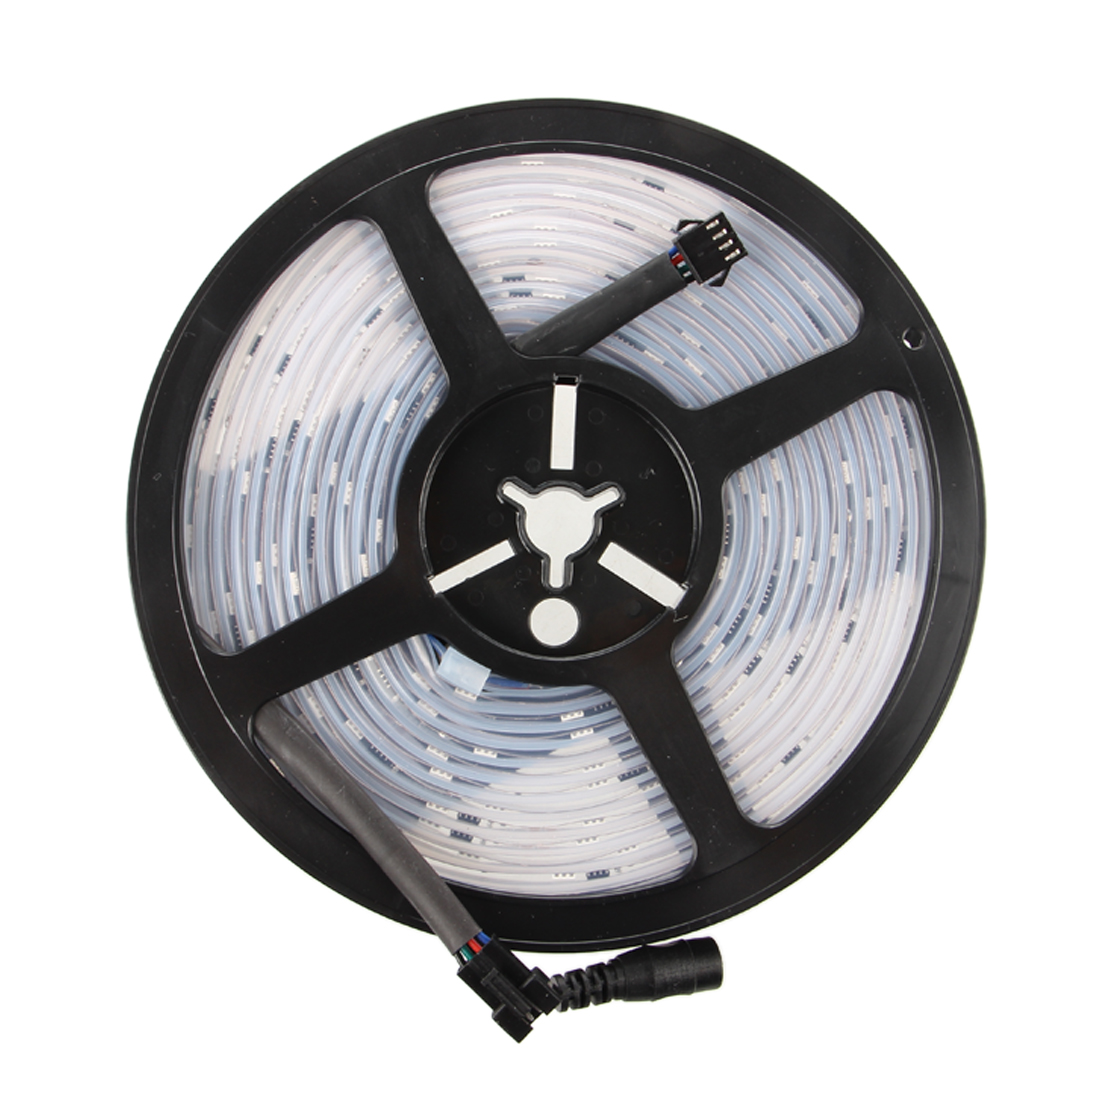 Cheapest 5M 5050SMD RGB LED 6803IC Strip Light Chasing Magic Dream Color Addressable